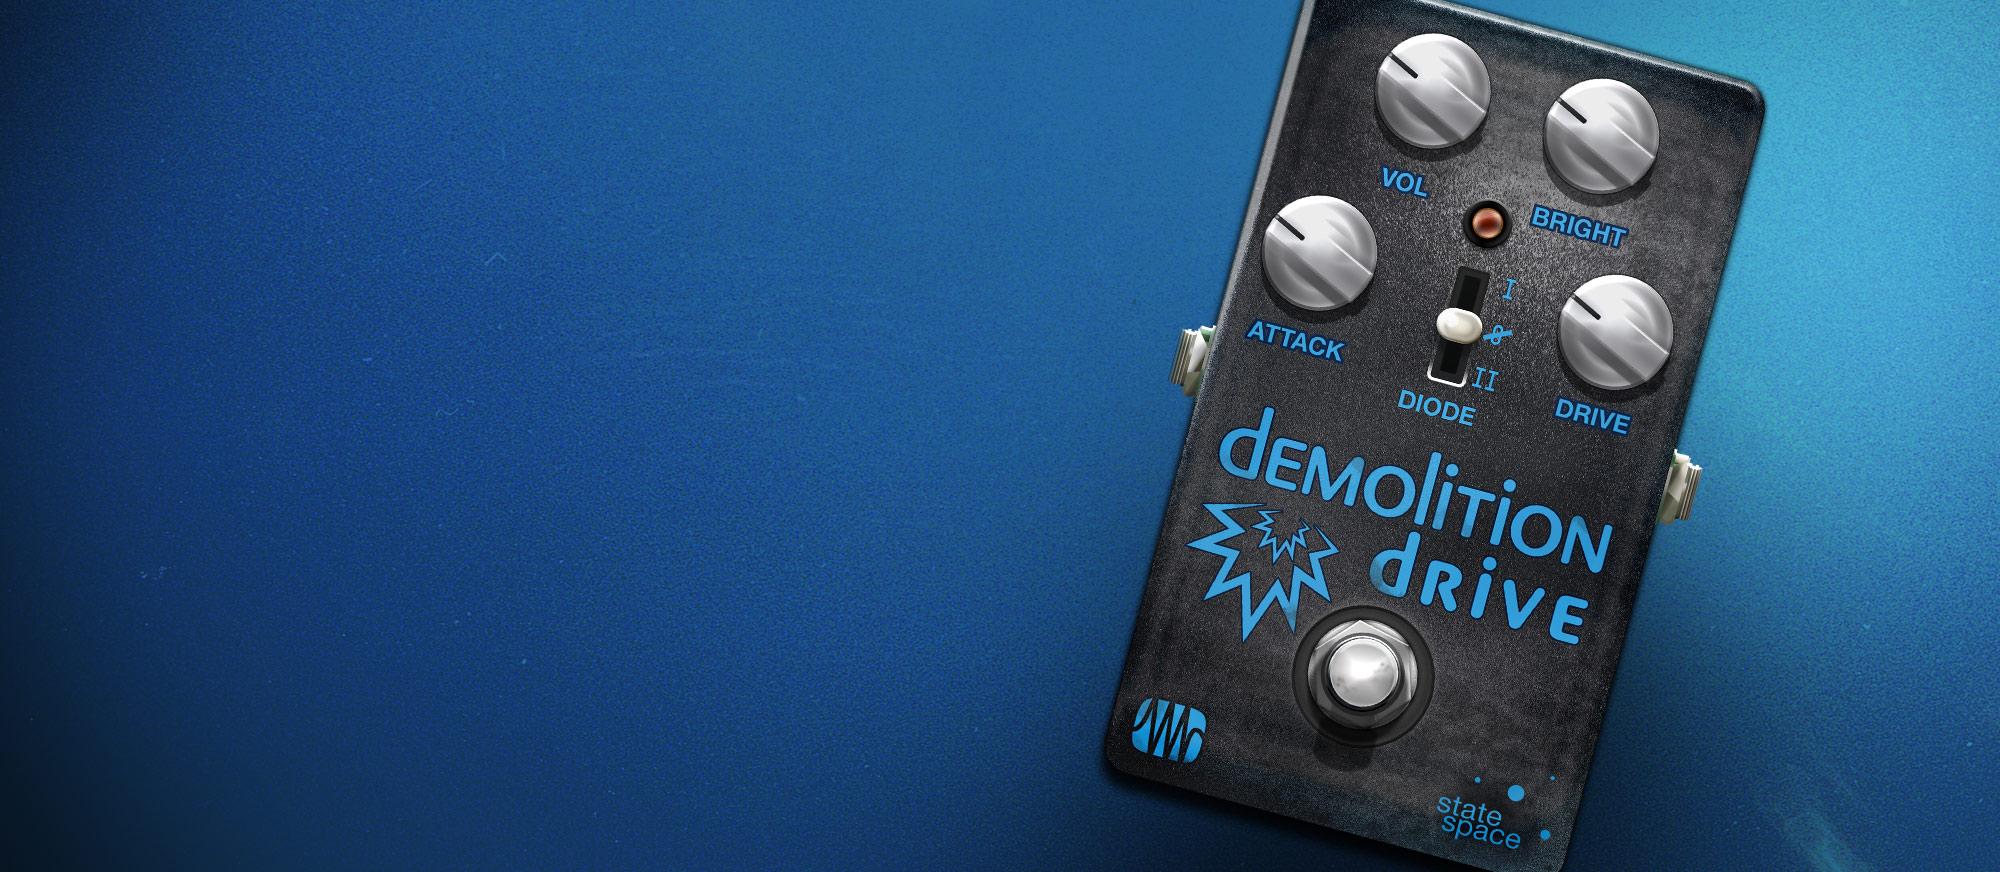 Demolition Drive user interface